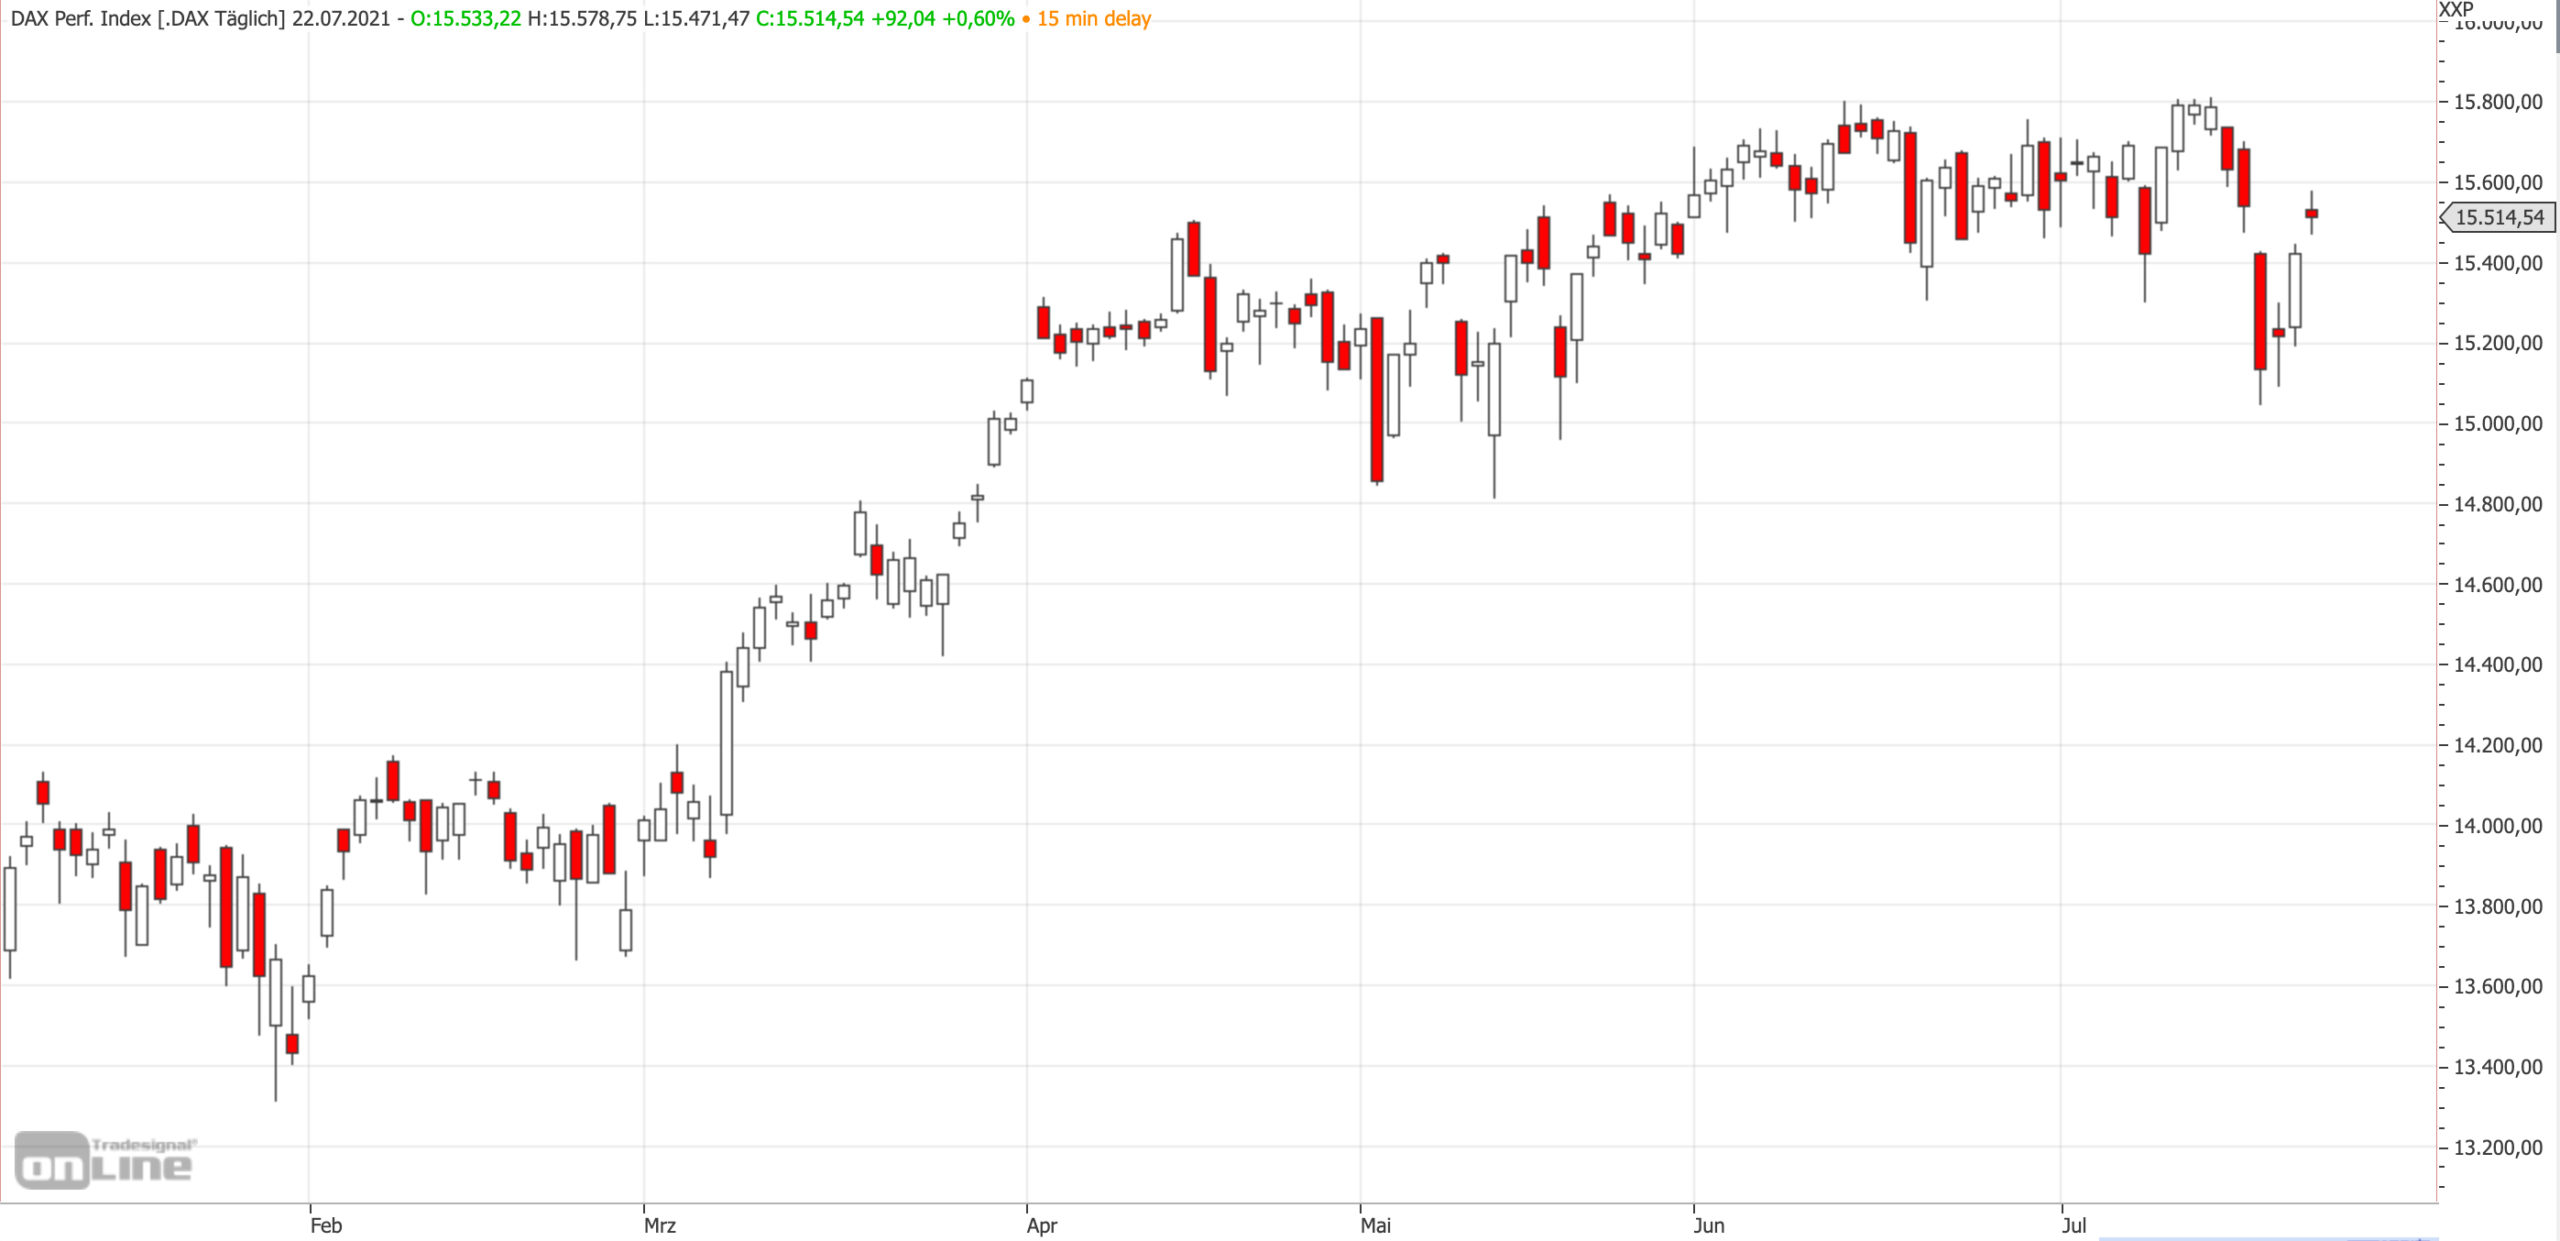 Mittelfristiger DAX-Chart am 22.07.2021